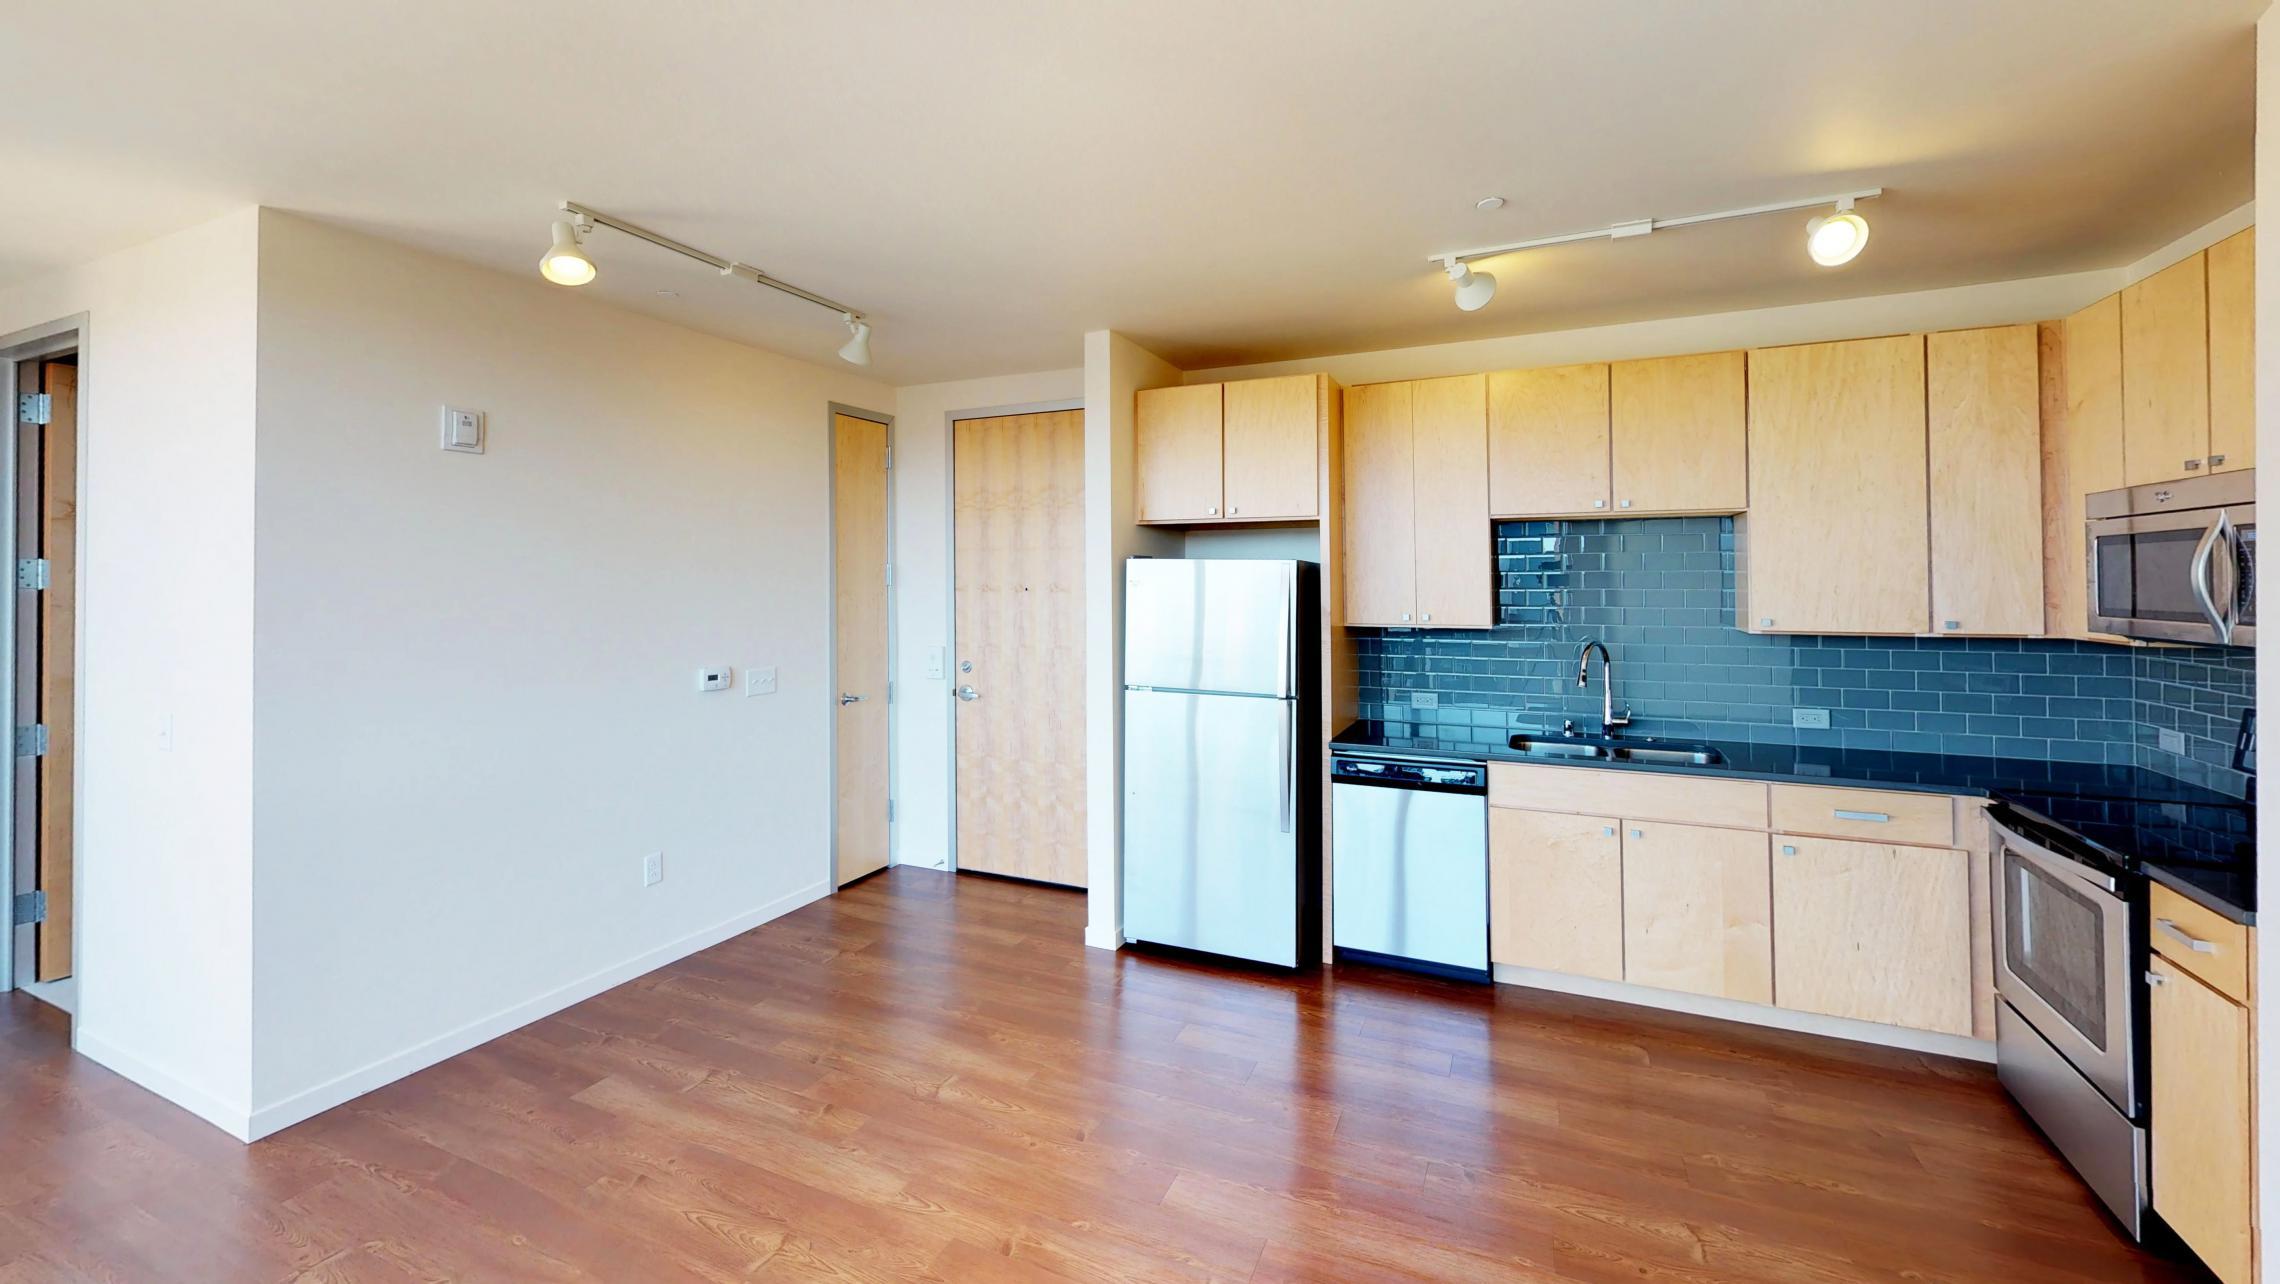 Nine-Line-Apartment-410-one bedroom-kitchen-modern.jpg